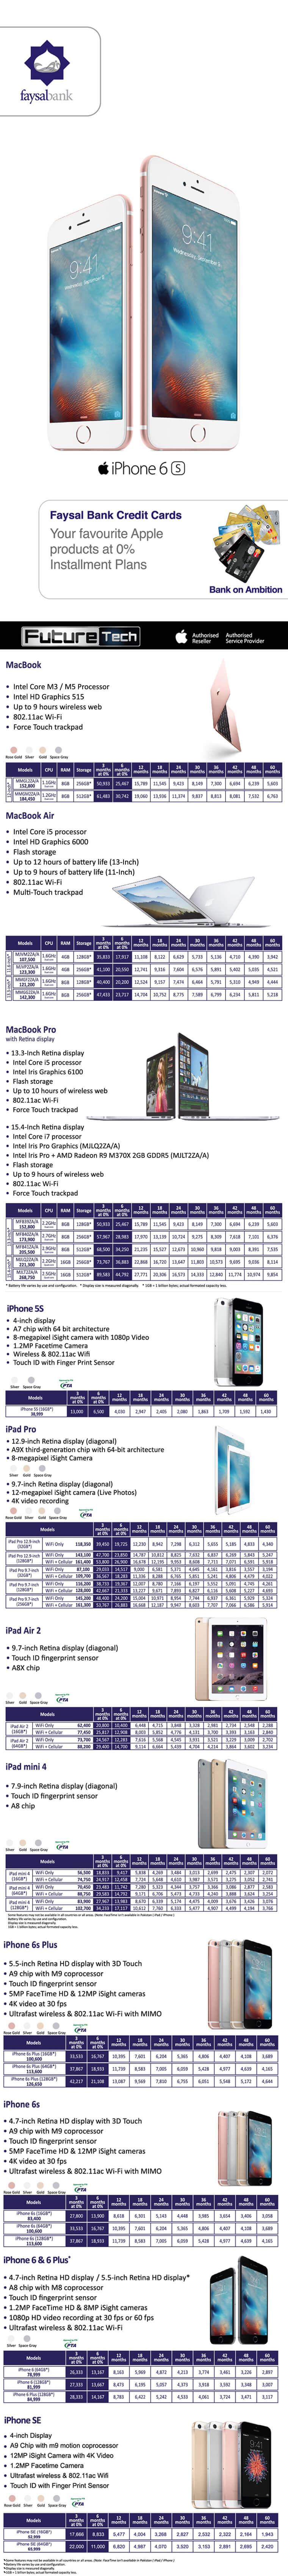 Apple 0% installment plan - Faysal Bank